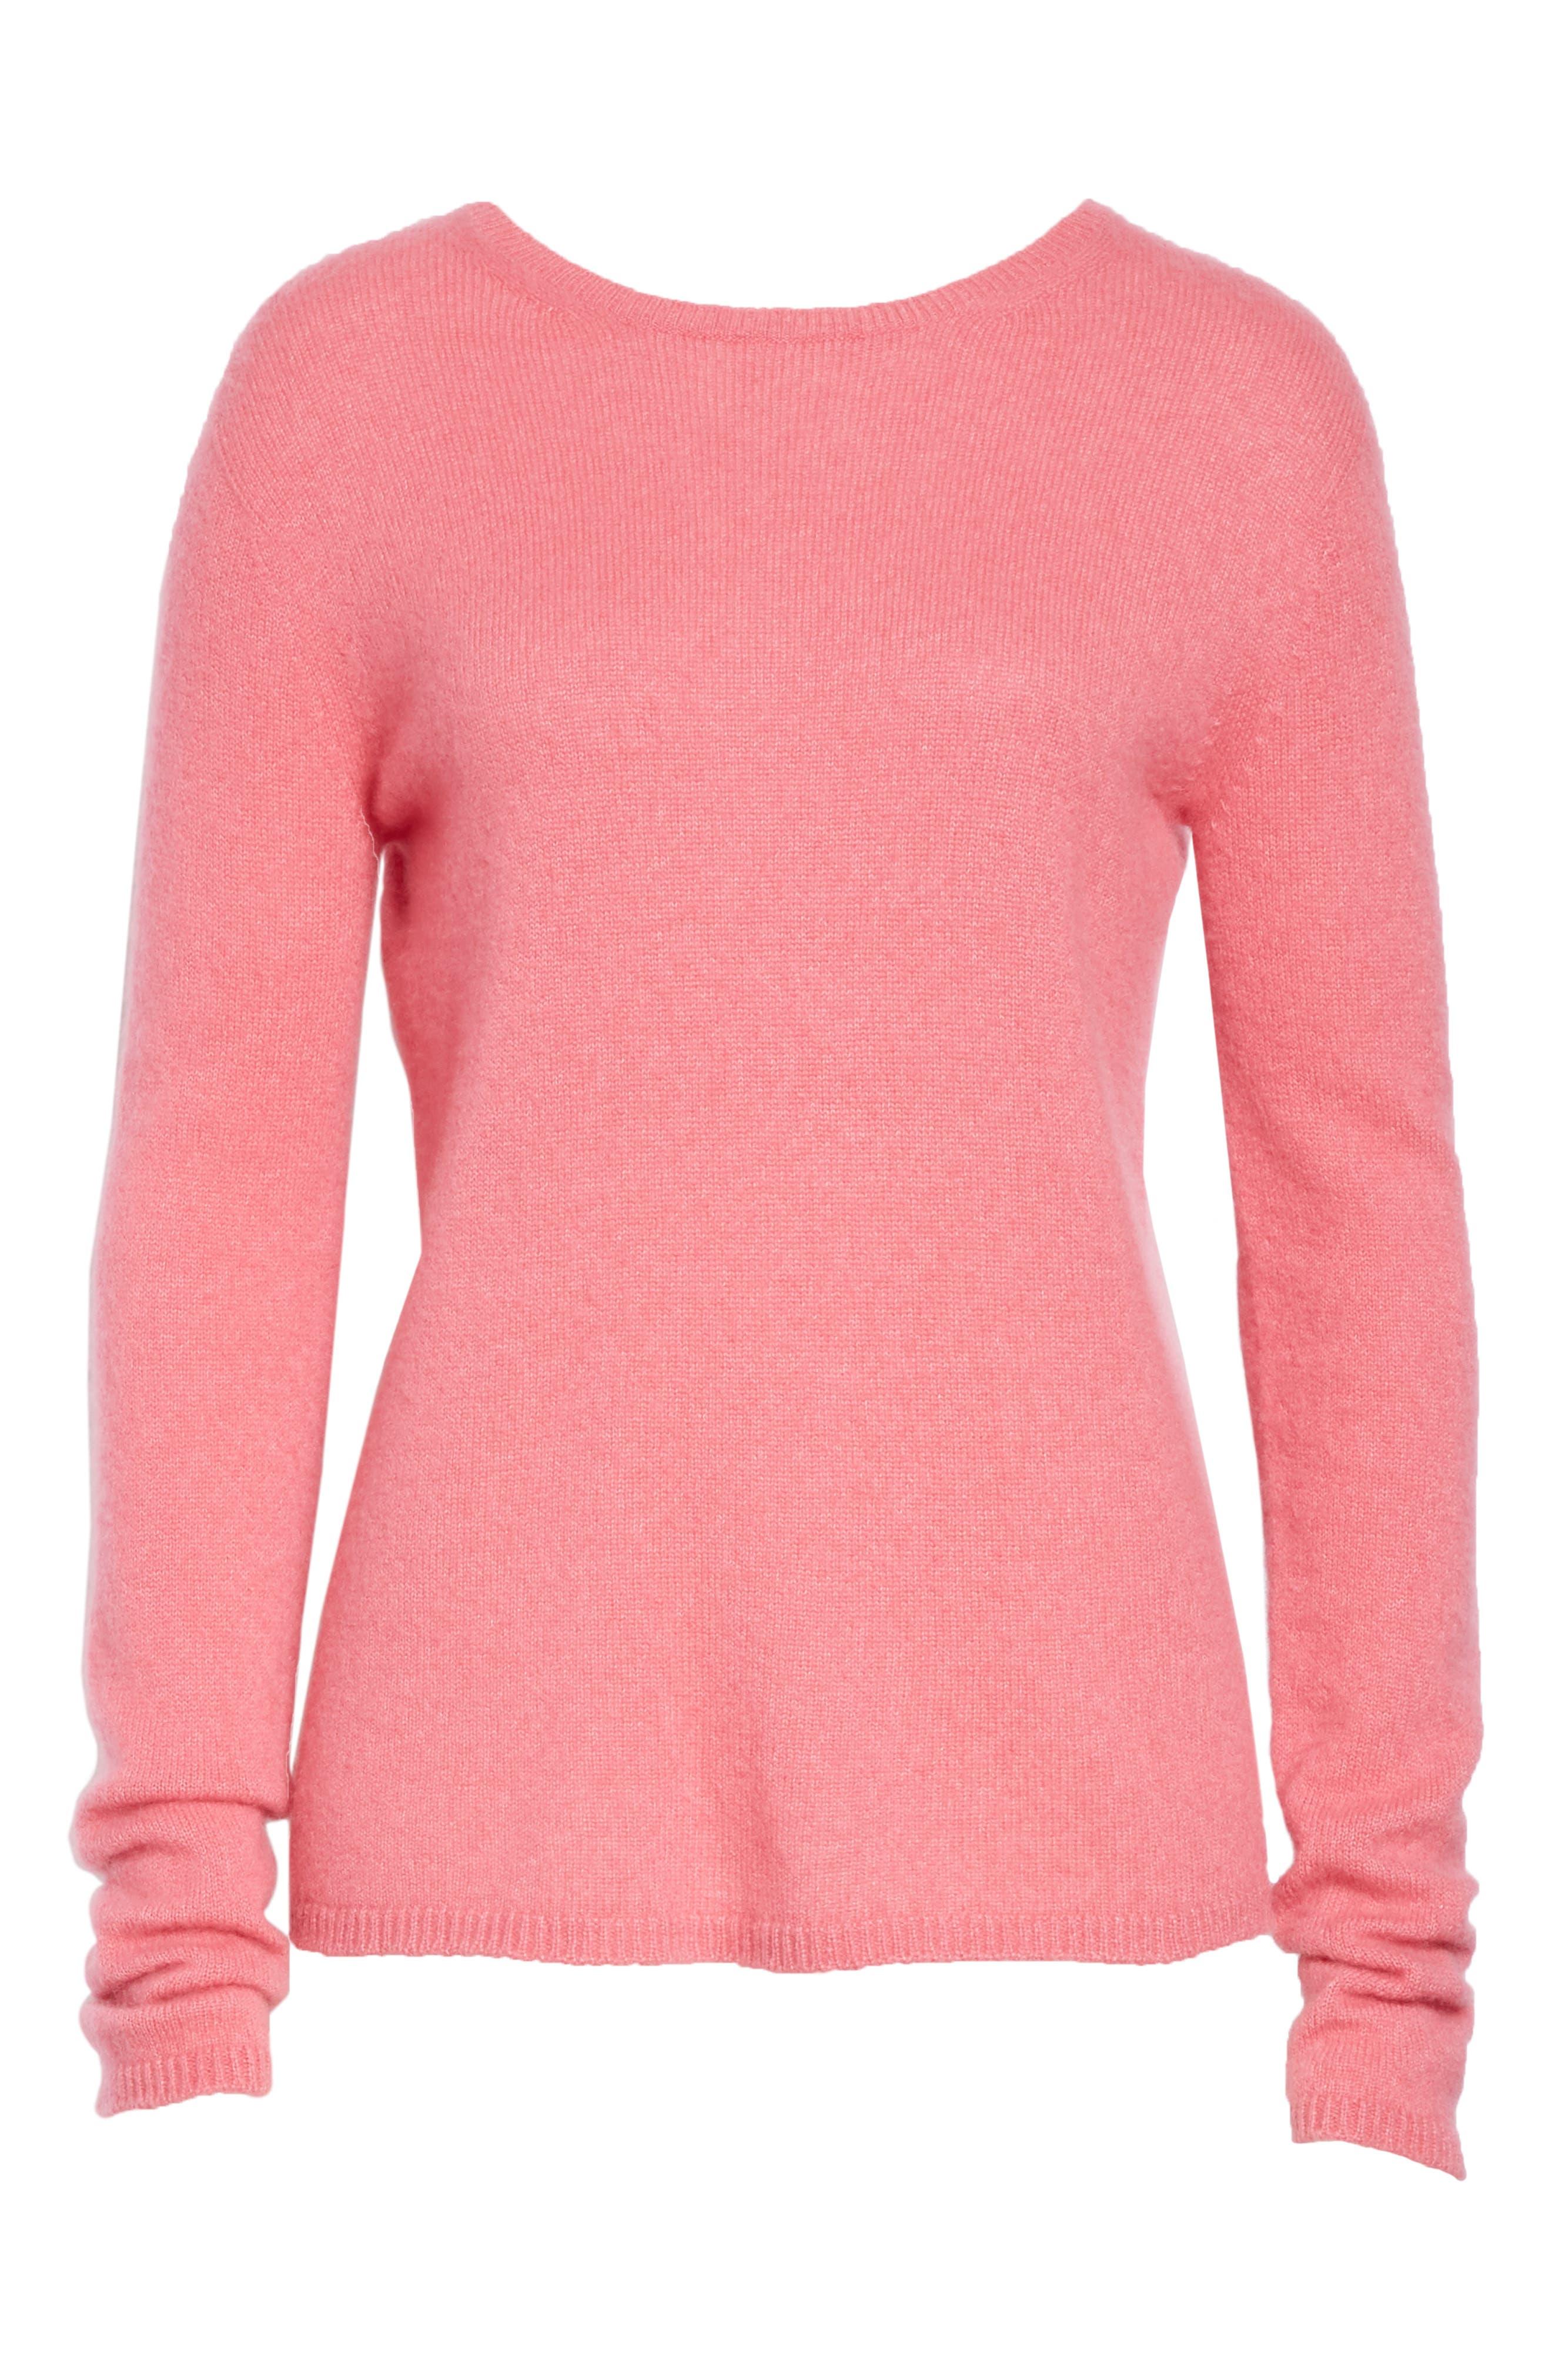 MAX MARA, Stelvio Cashmere & Silk Sweater, Alternate thumbnail 6, color, 672